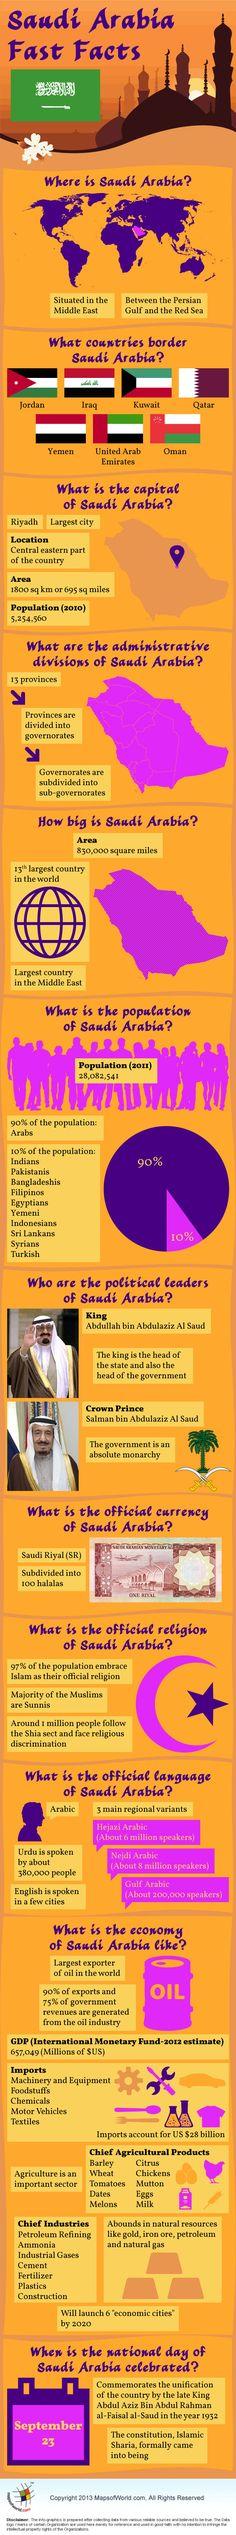 Infographic of Saudi Arabia Facts